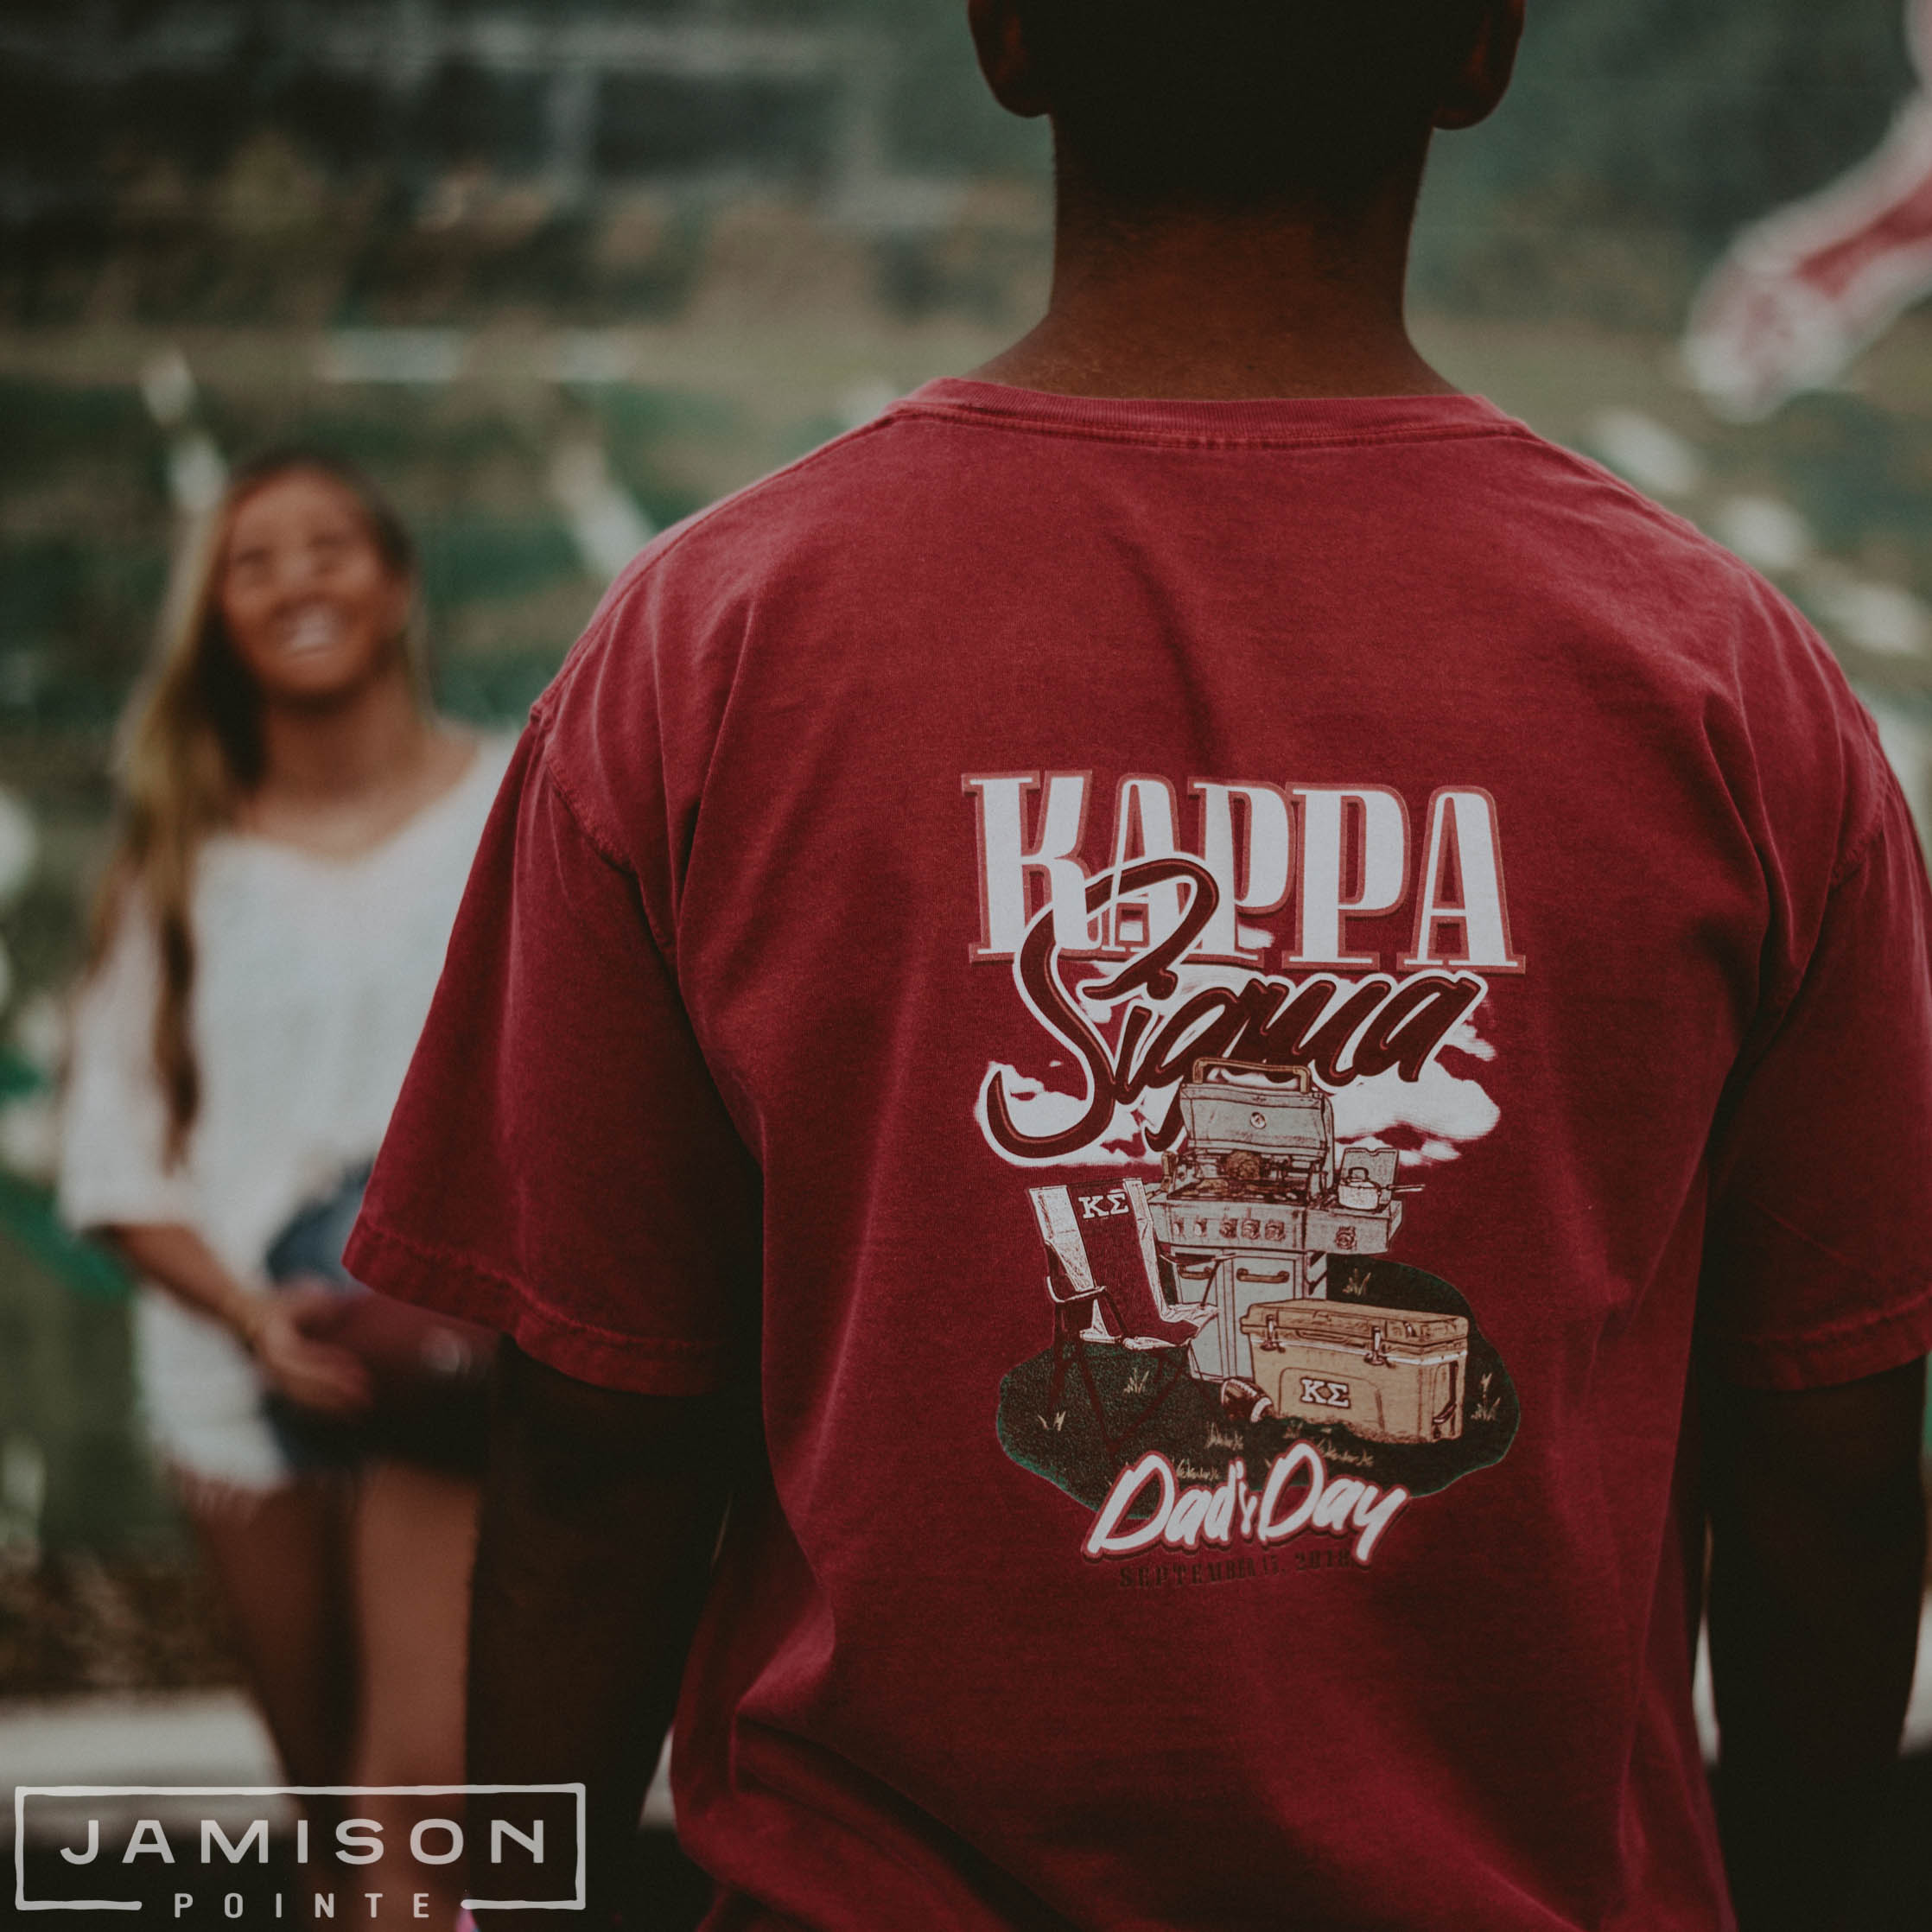 Kappa Sigma Dad's Day Tee